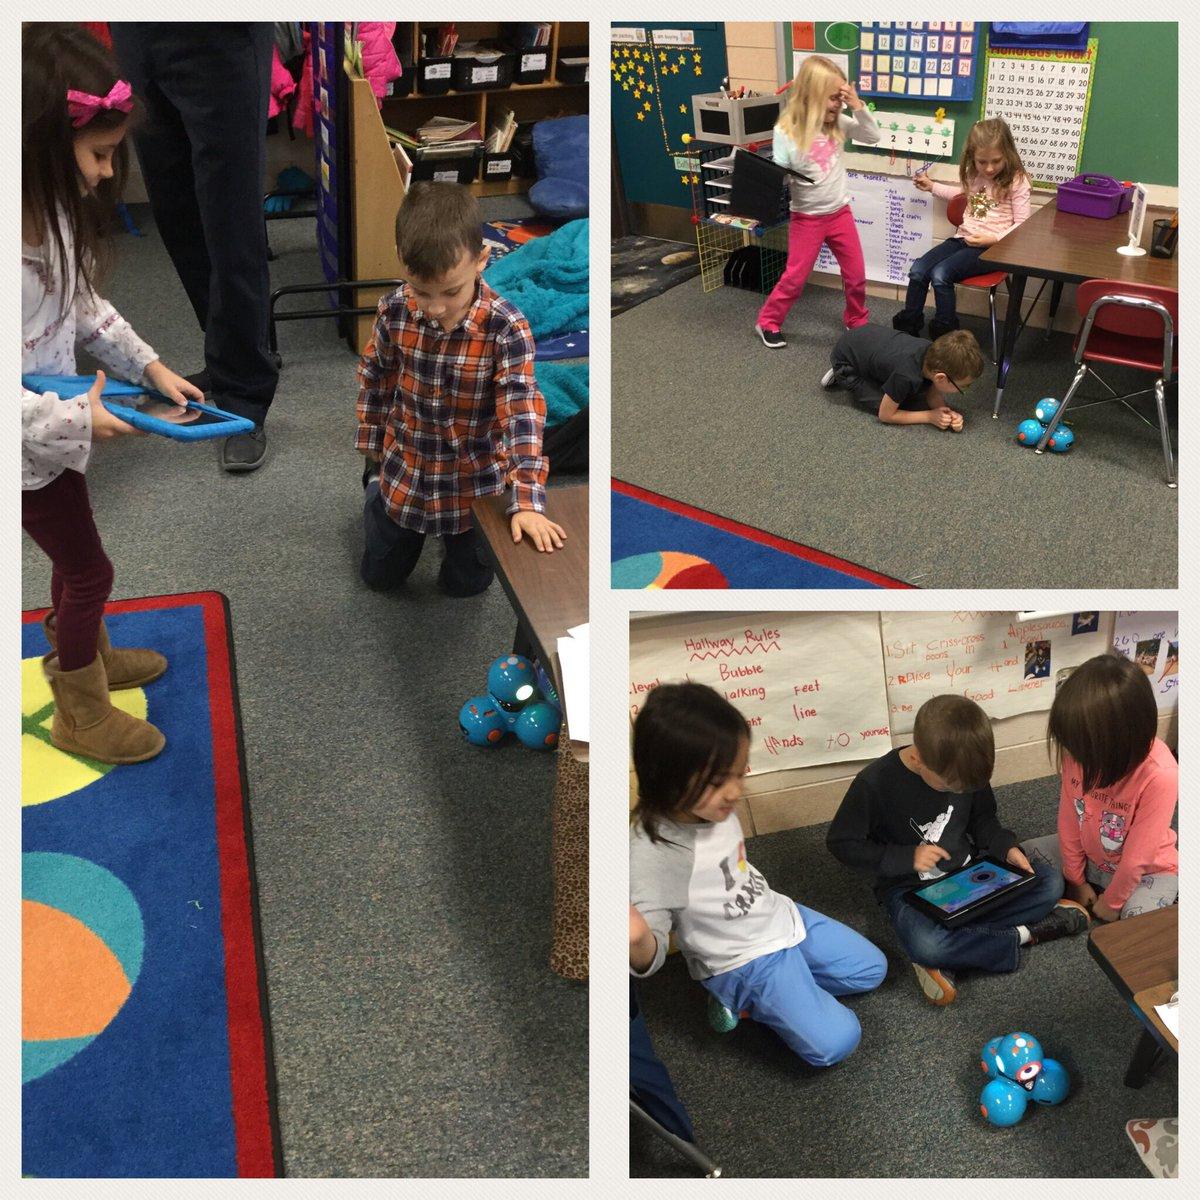 Tori Hostetter On Twitter Having 8 Dash Robots In Our Classroom Made For A Fun Morning Of Exploring KatieKibler1 Eglane66 Smedsam3